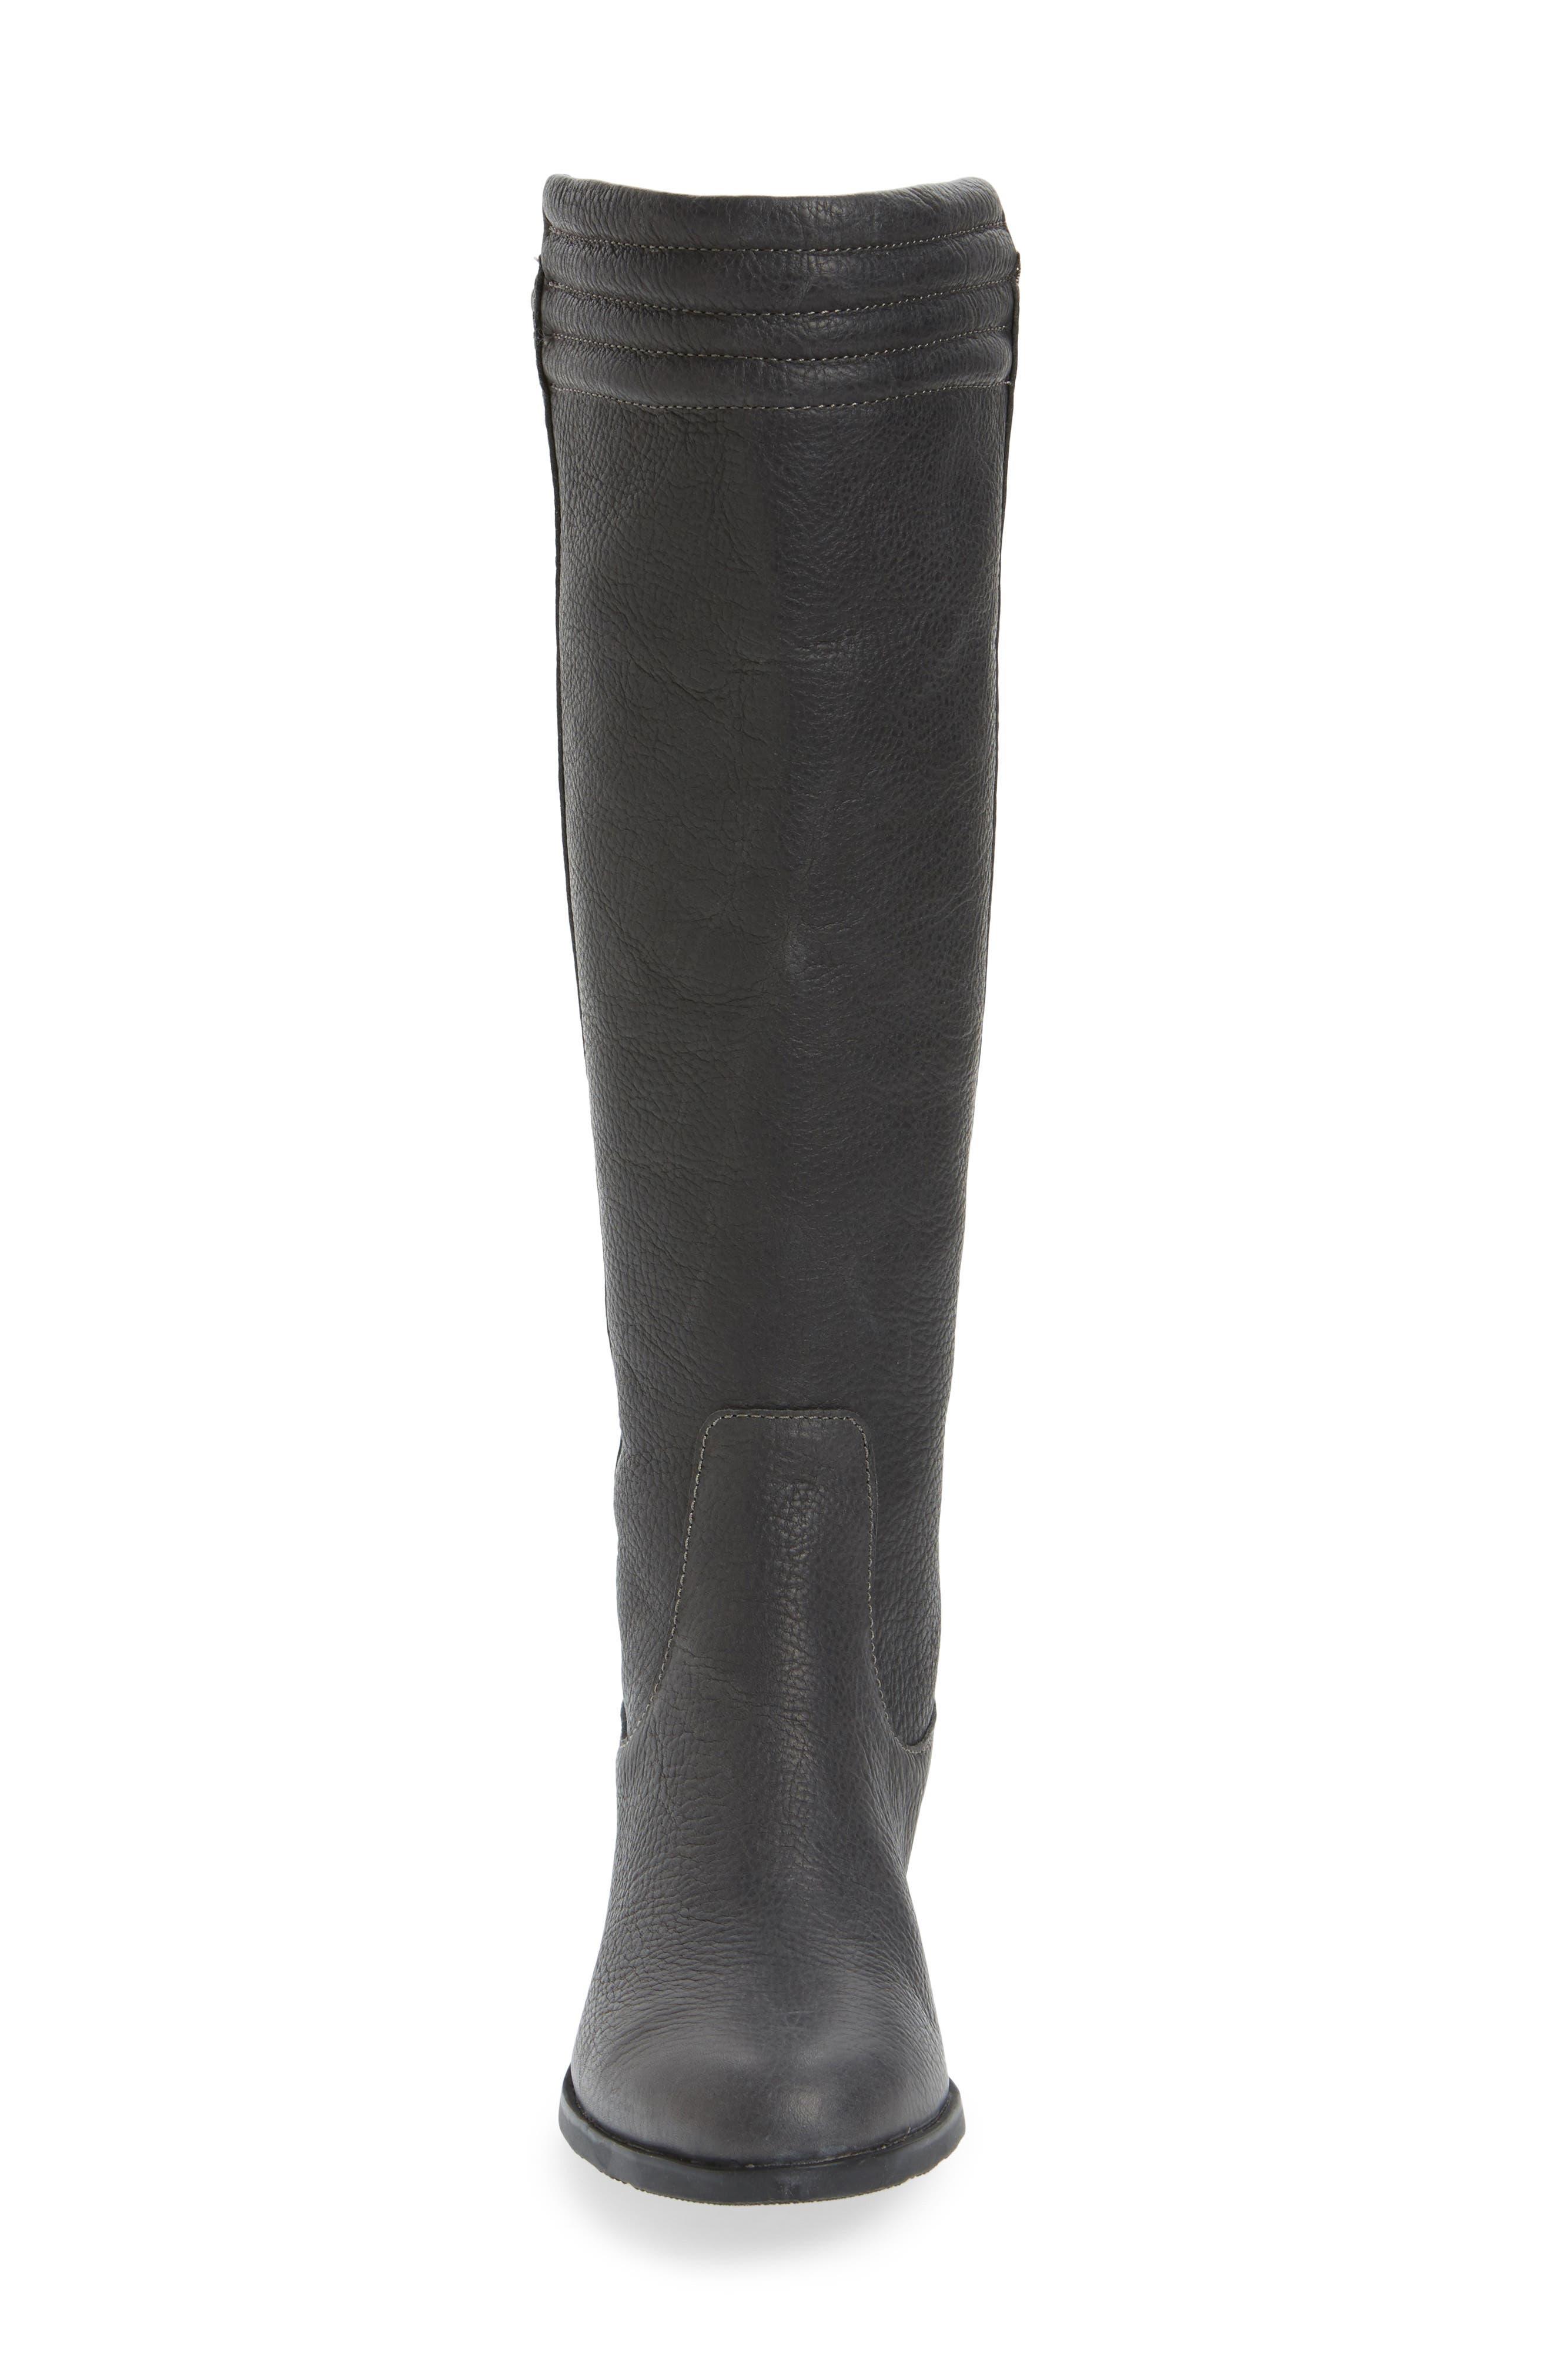 Danica Waterproof Knee High Boot,                             Alternate thumbnail 4, color,                             Quarry/ Black